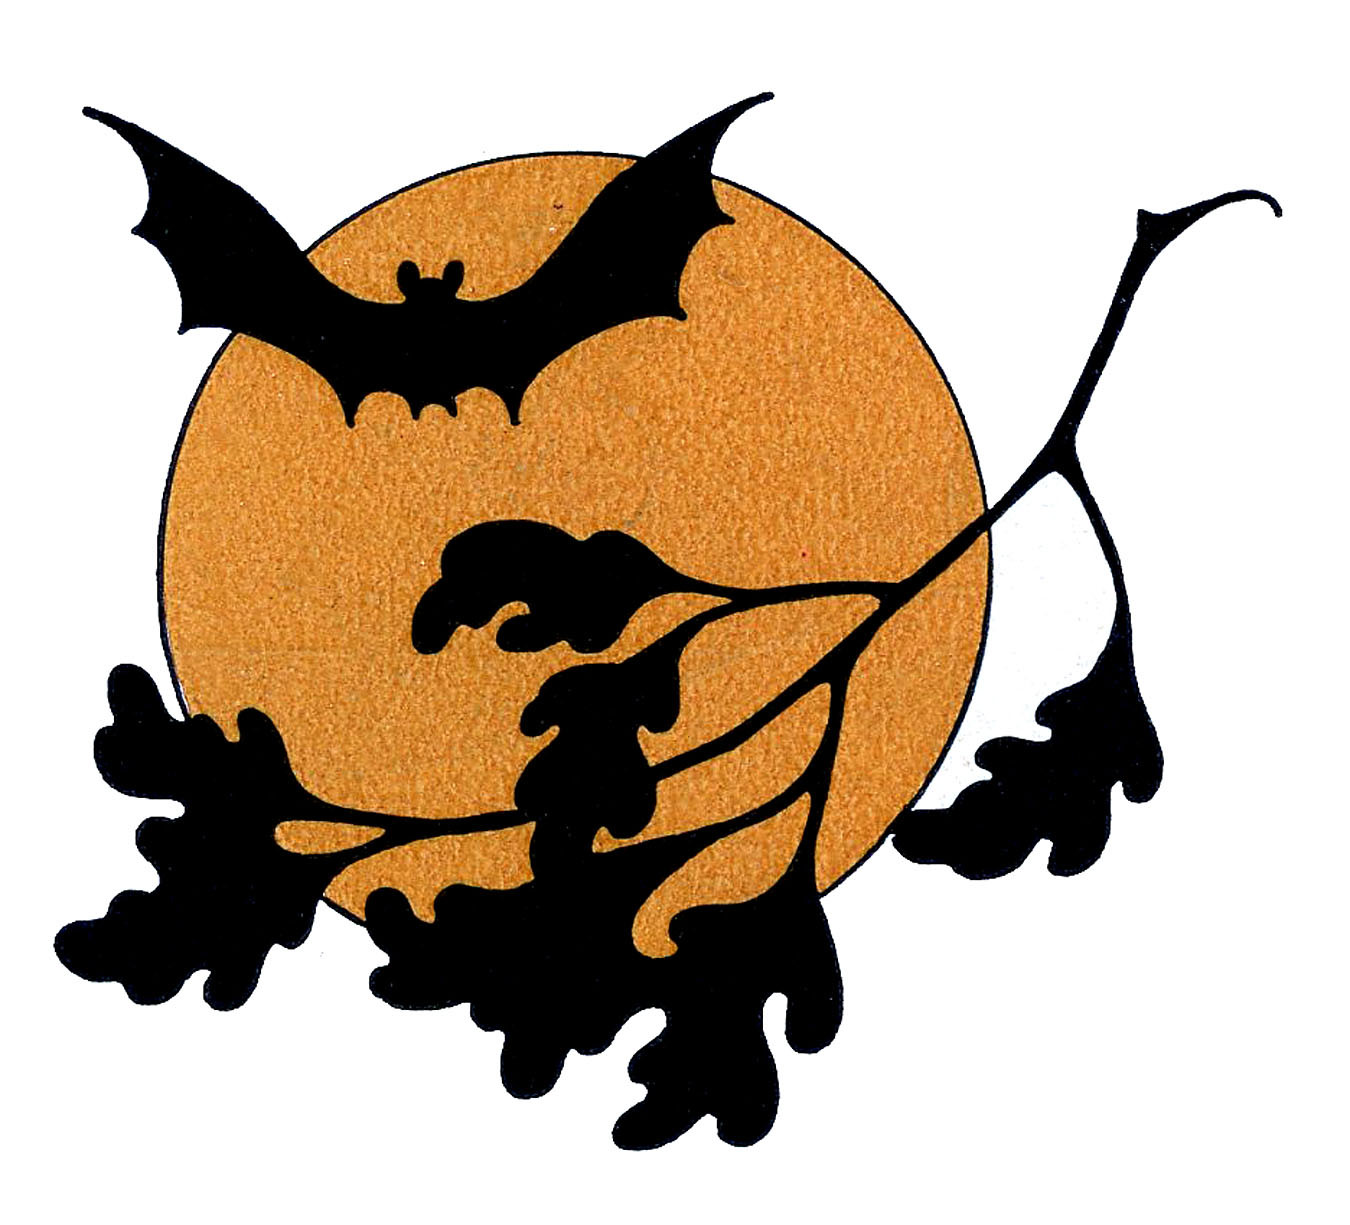 1350x1225 Clipart Of Bat Transitionsfv